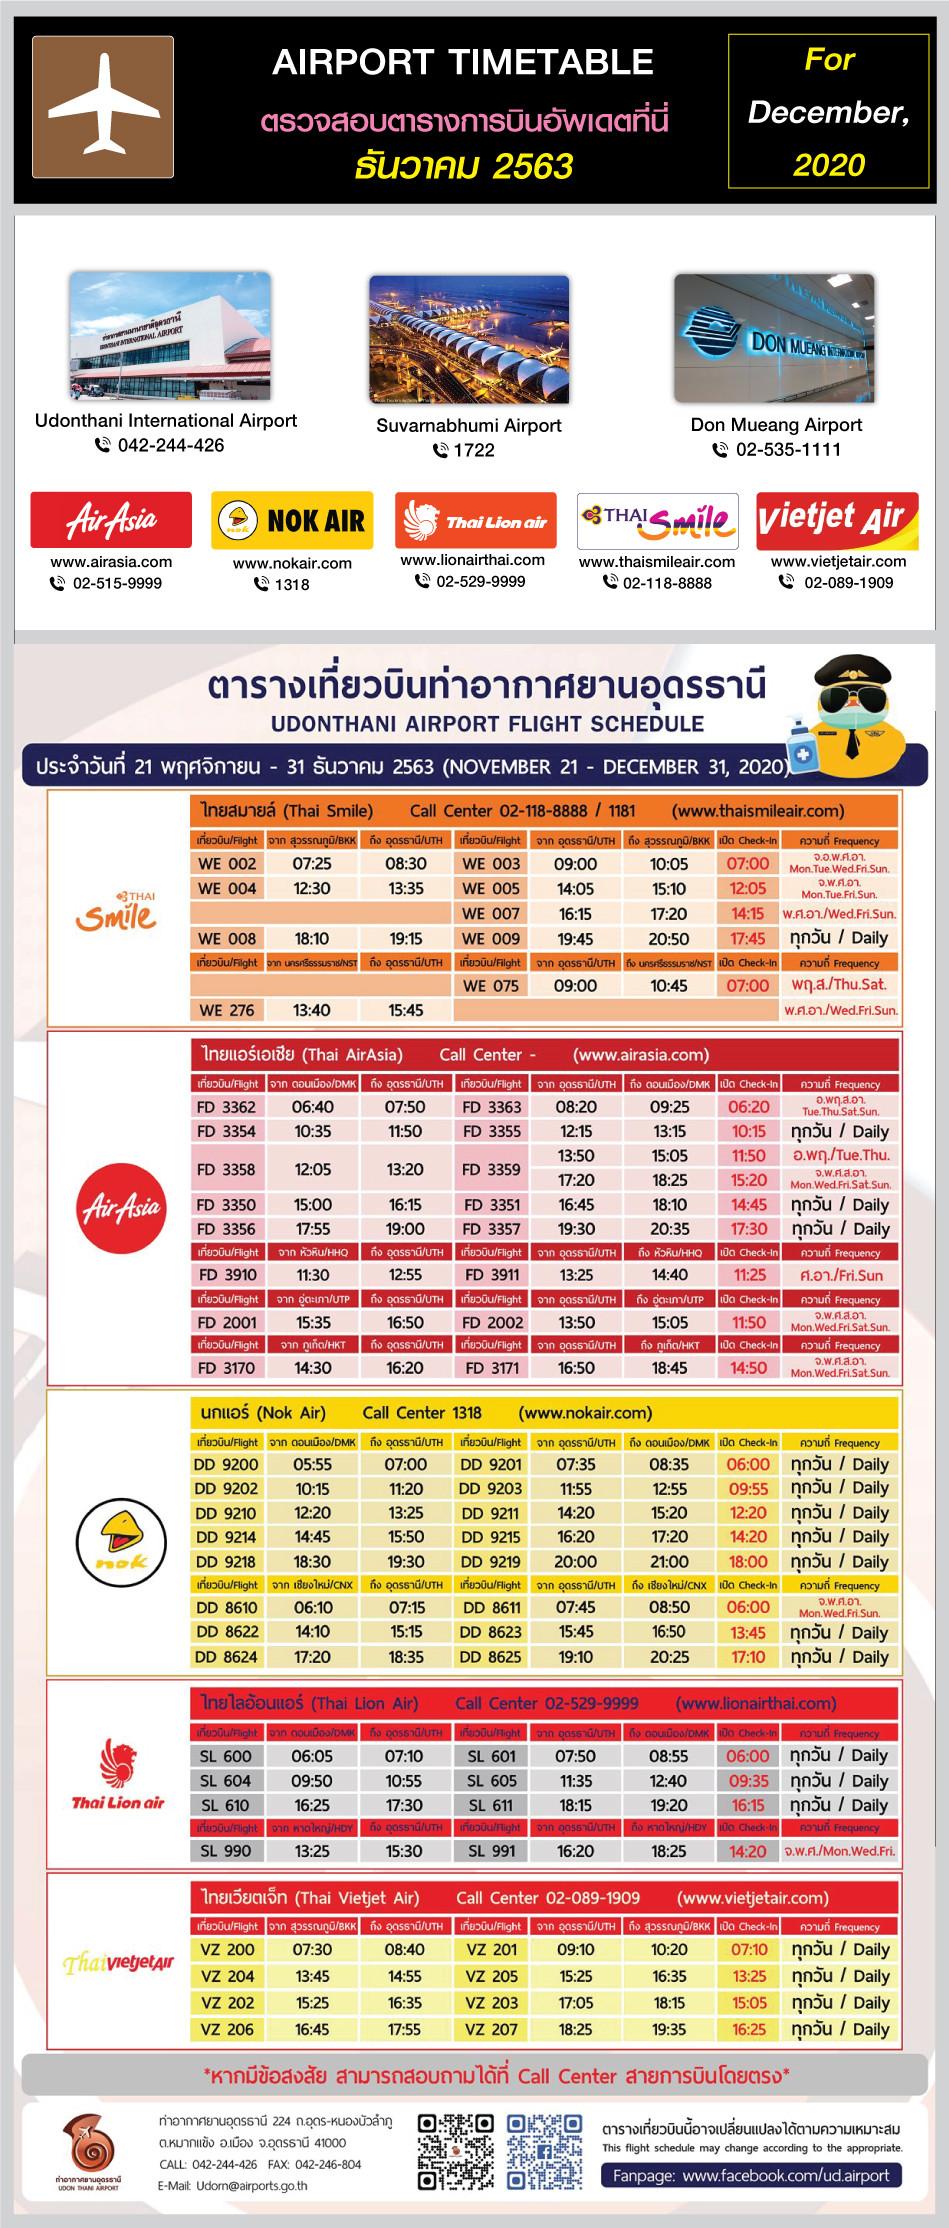 20.12 page Thai.jpg